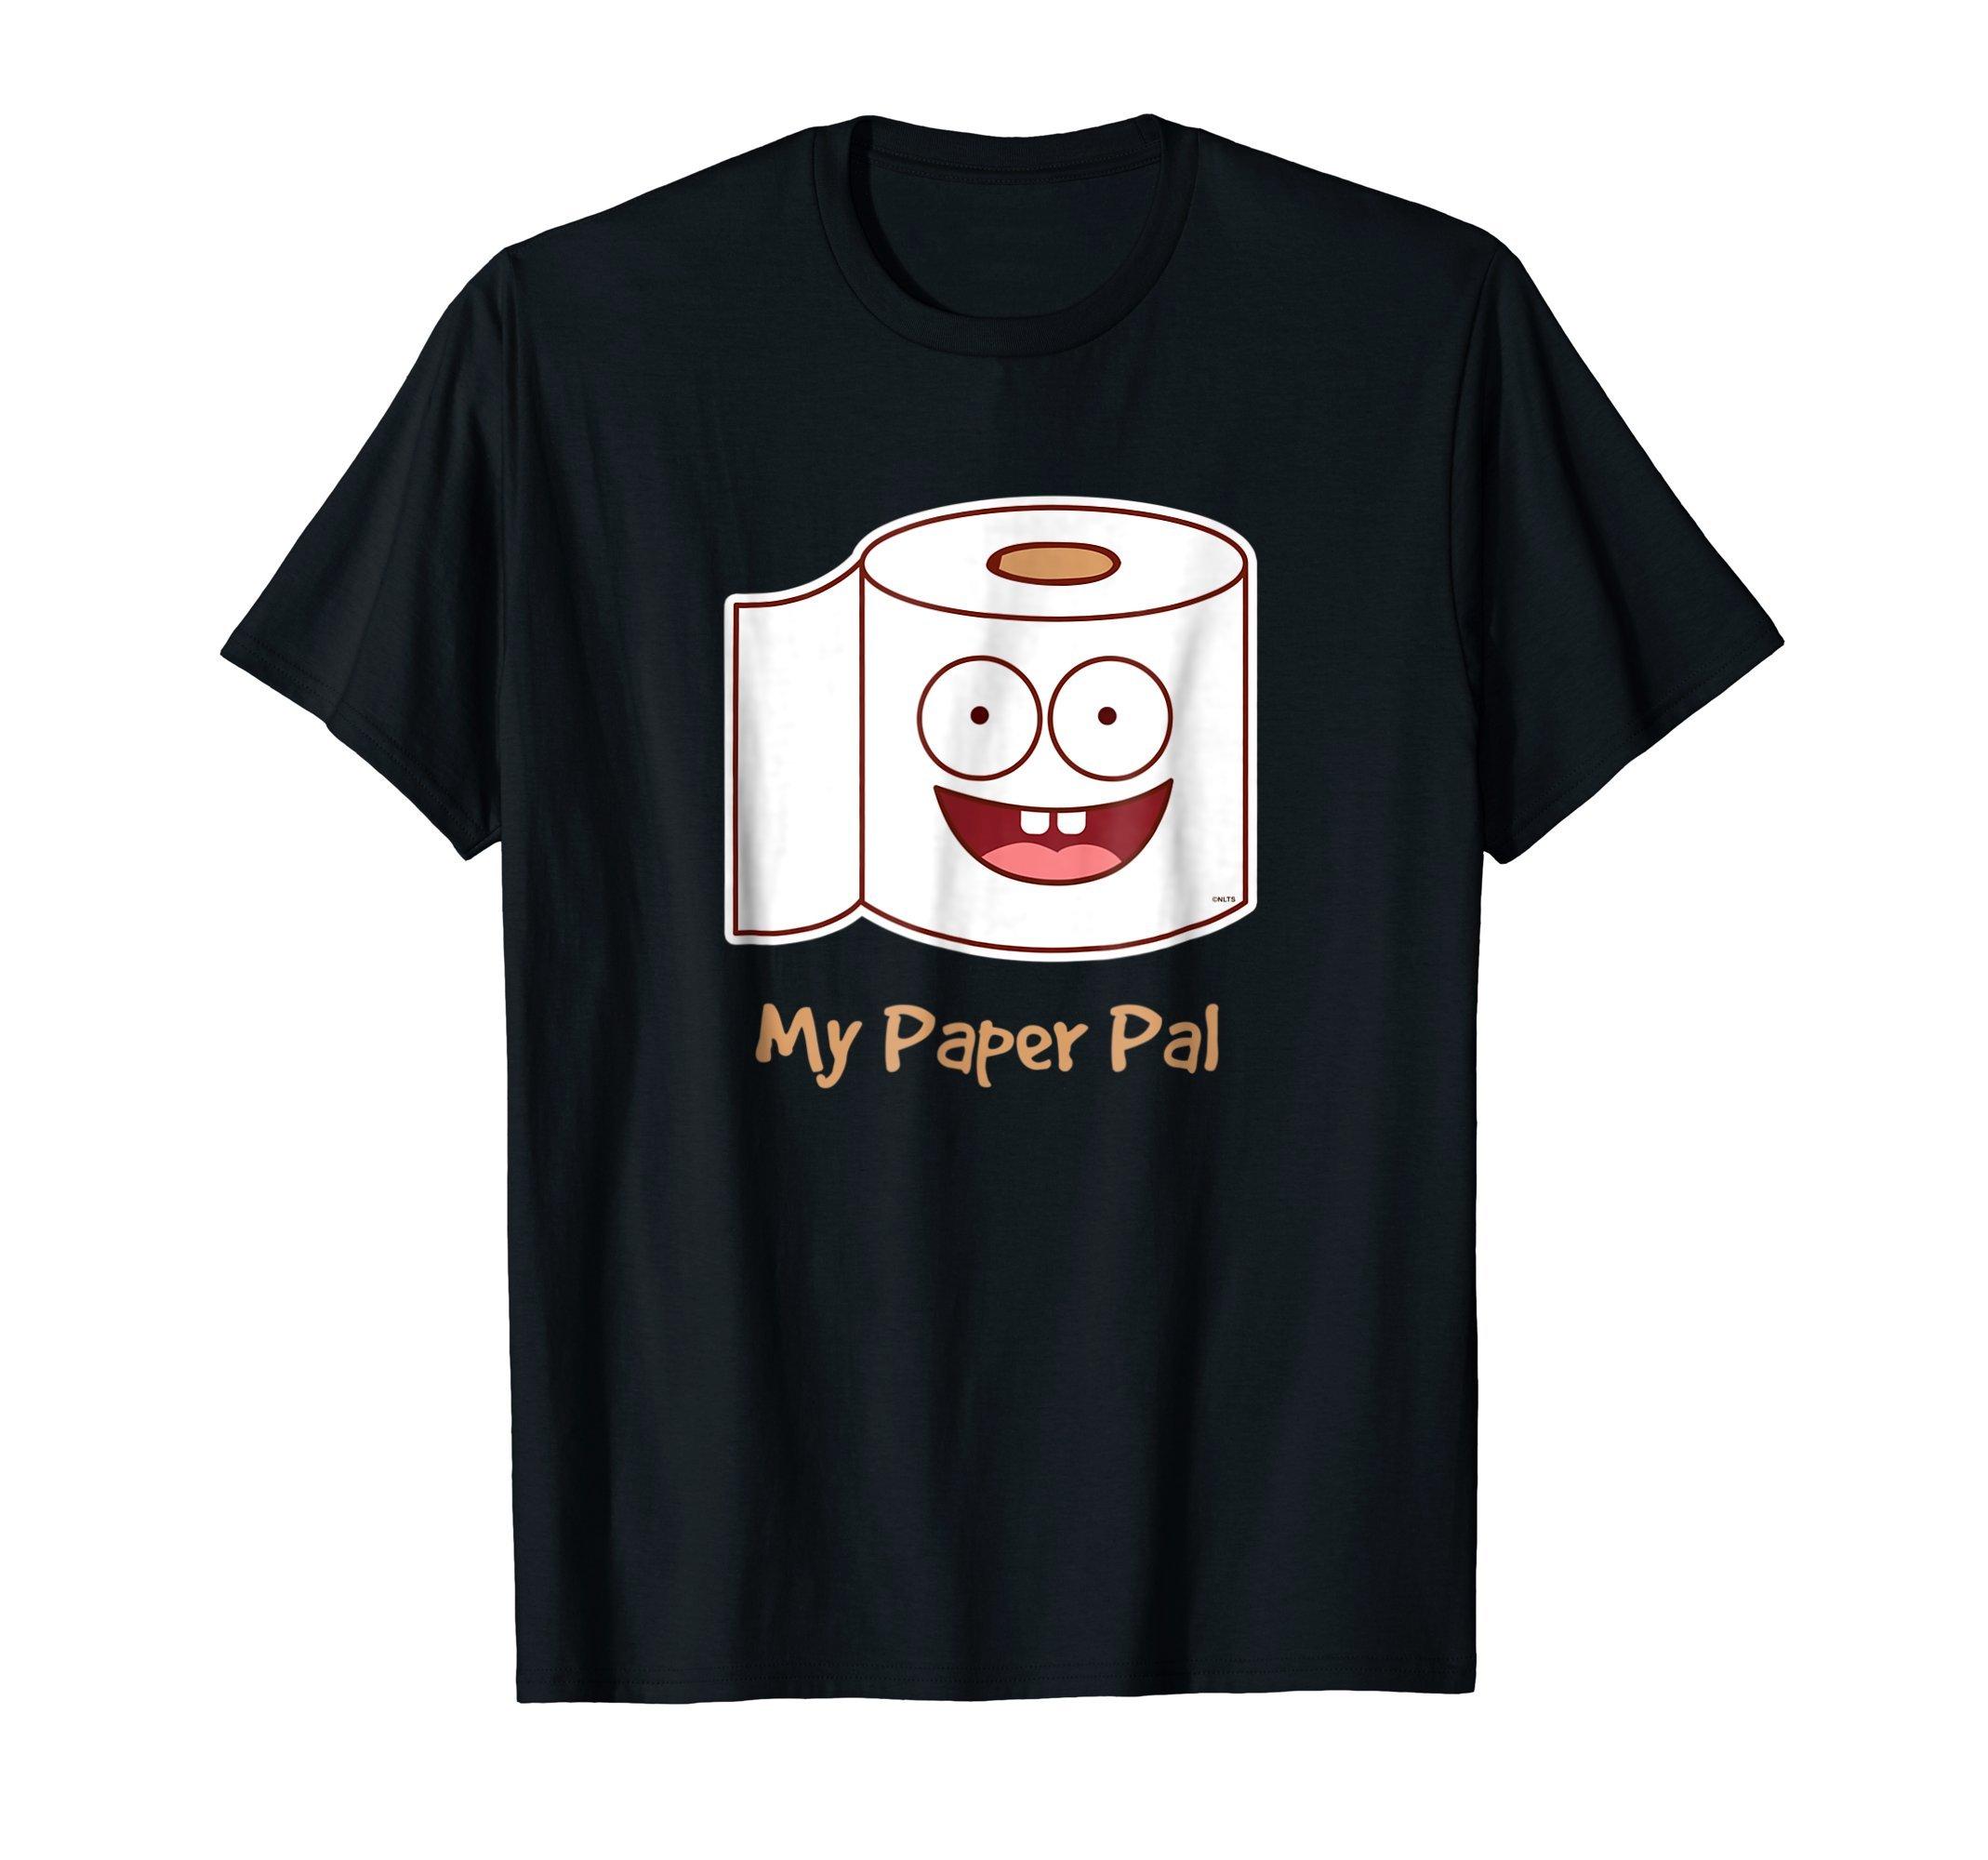 My-Paper-Pal-Humor-Funny-Toilet-Paper-T-Shirt-Tee-Shirt-gift